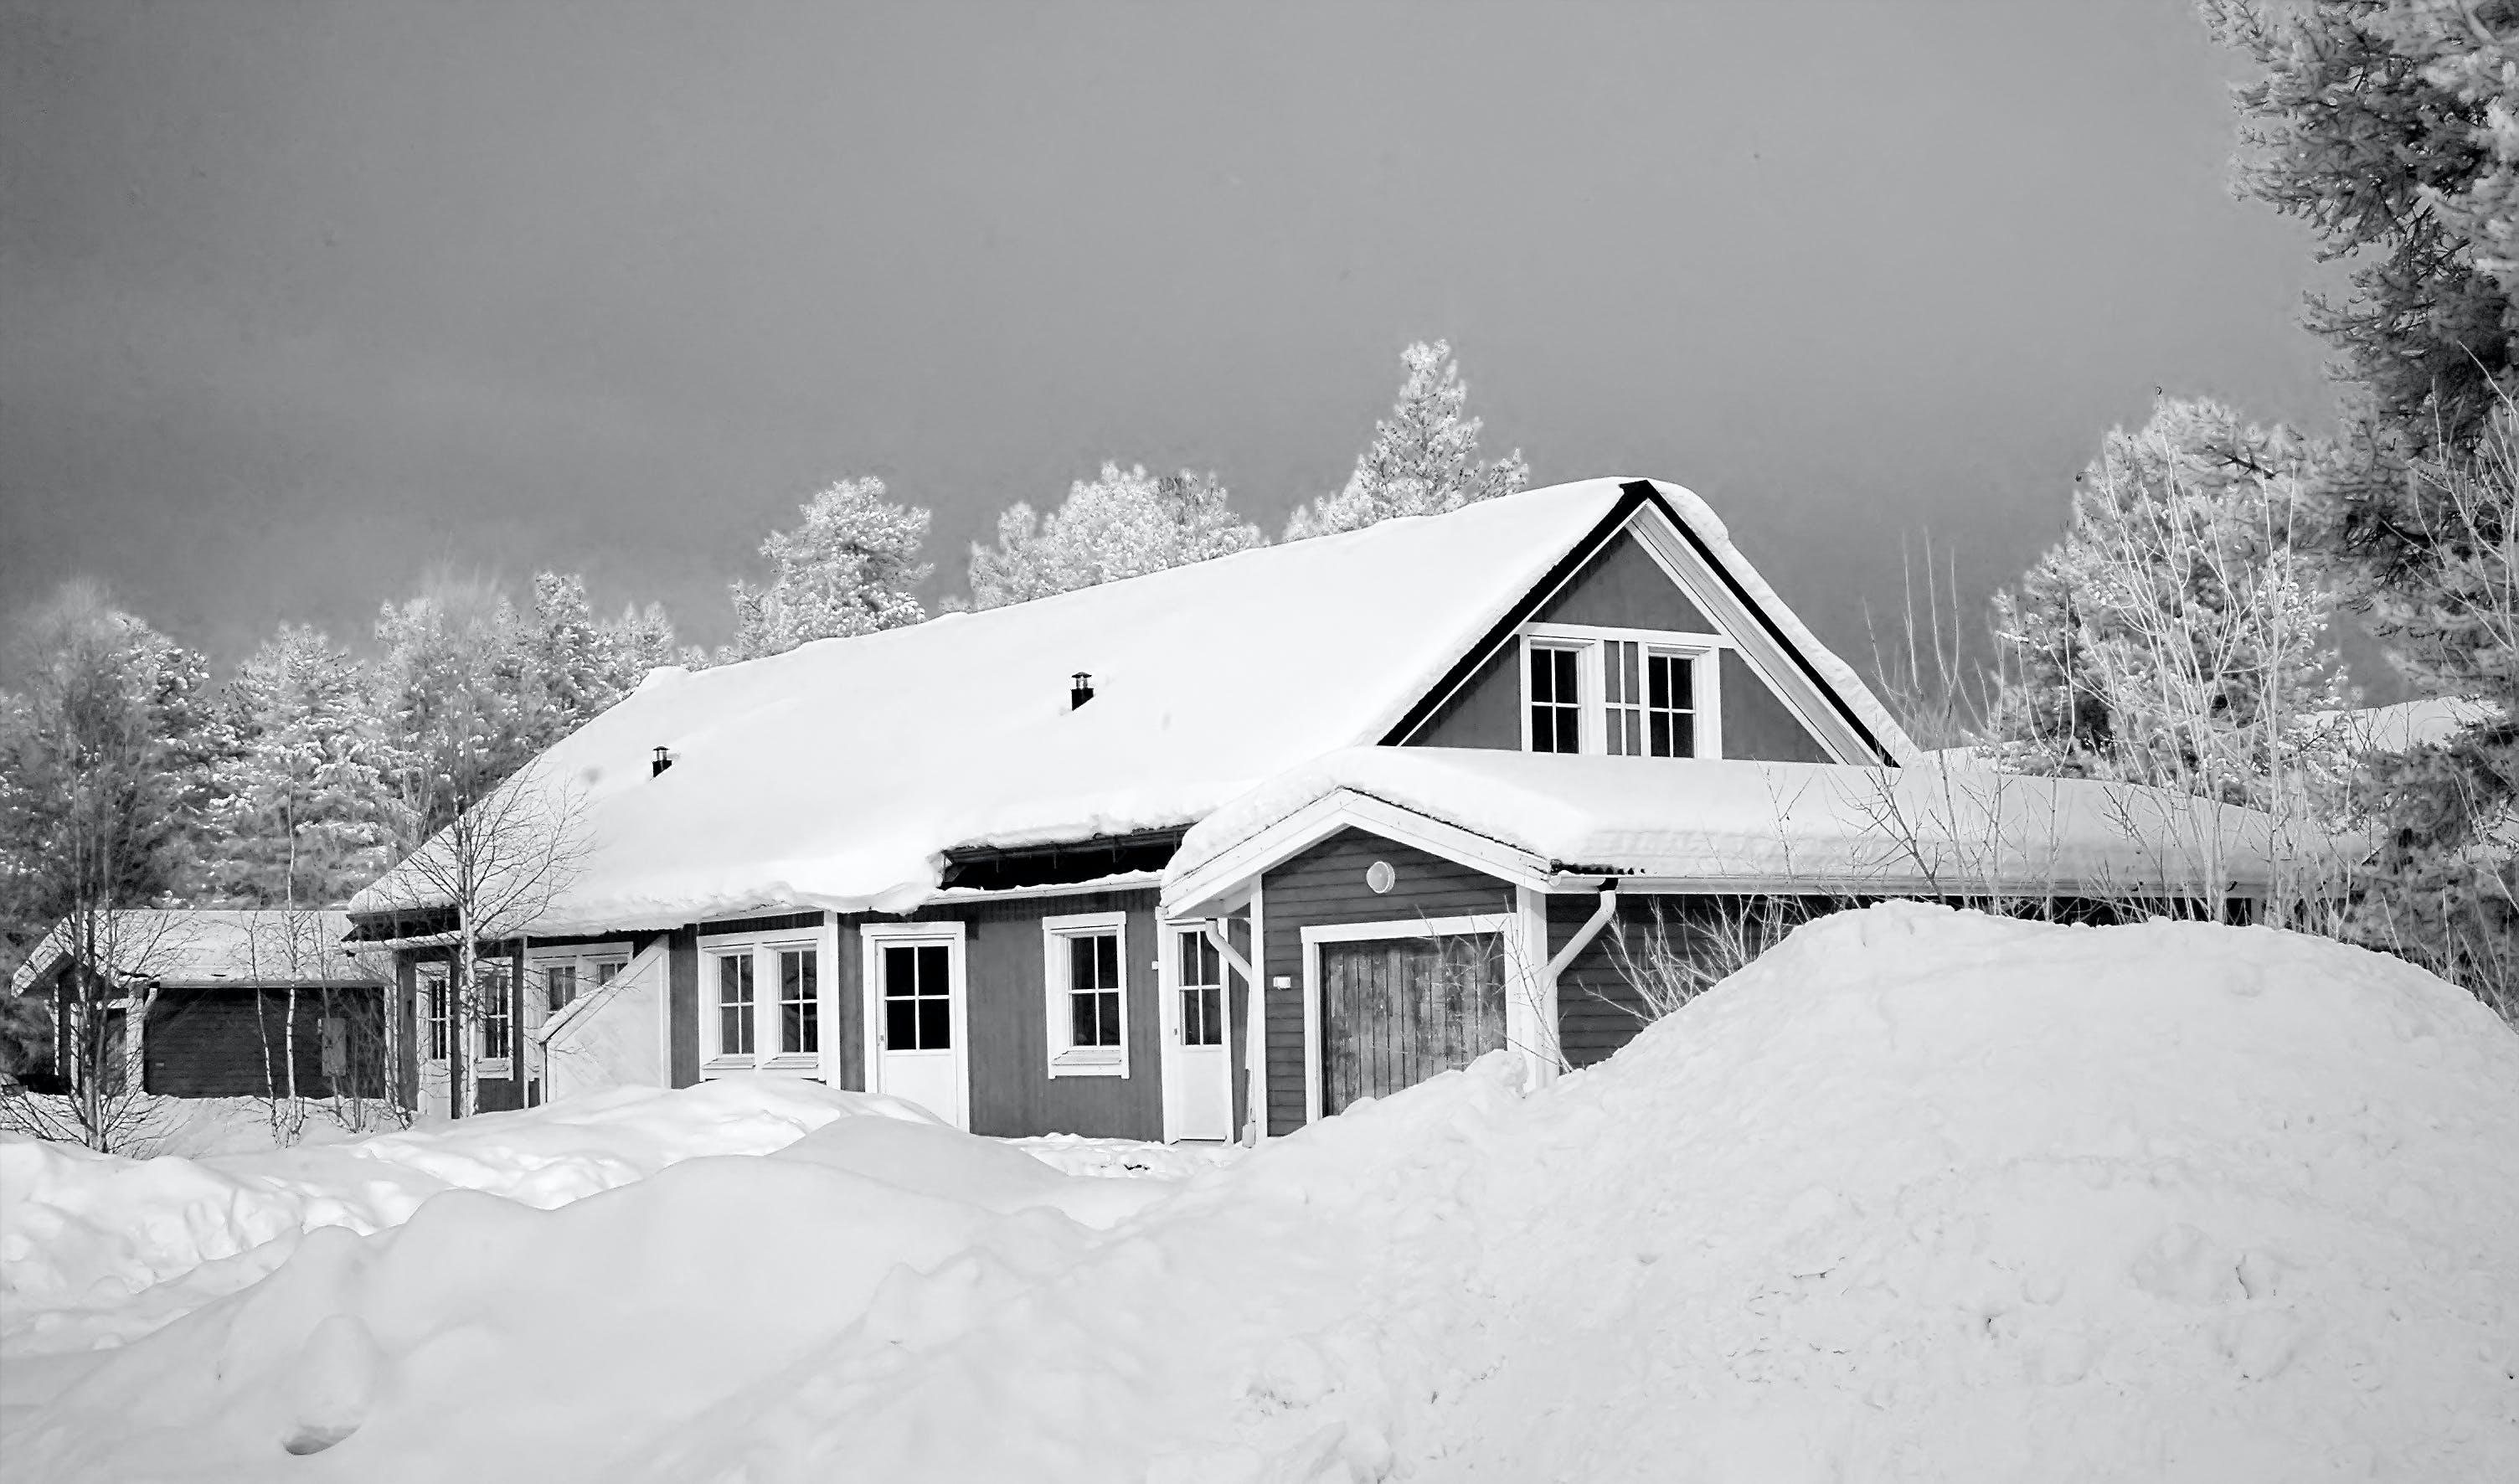 enviro, 下雪的, 冬季, 冰 的 免費圖庫相片